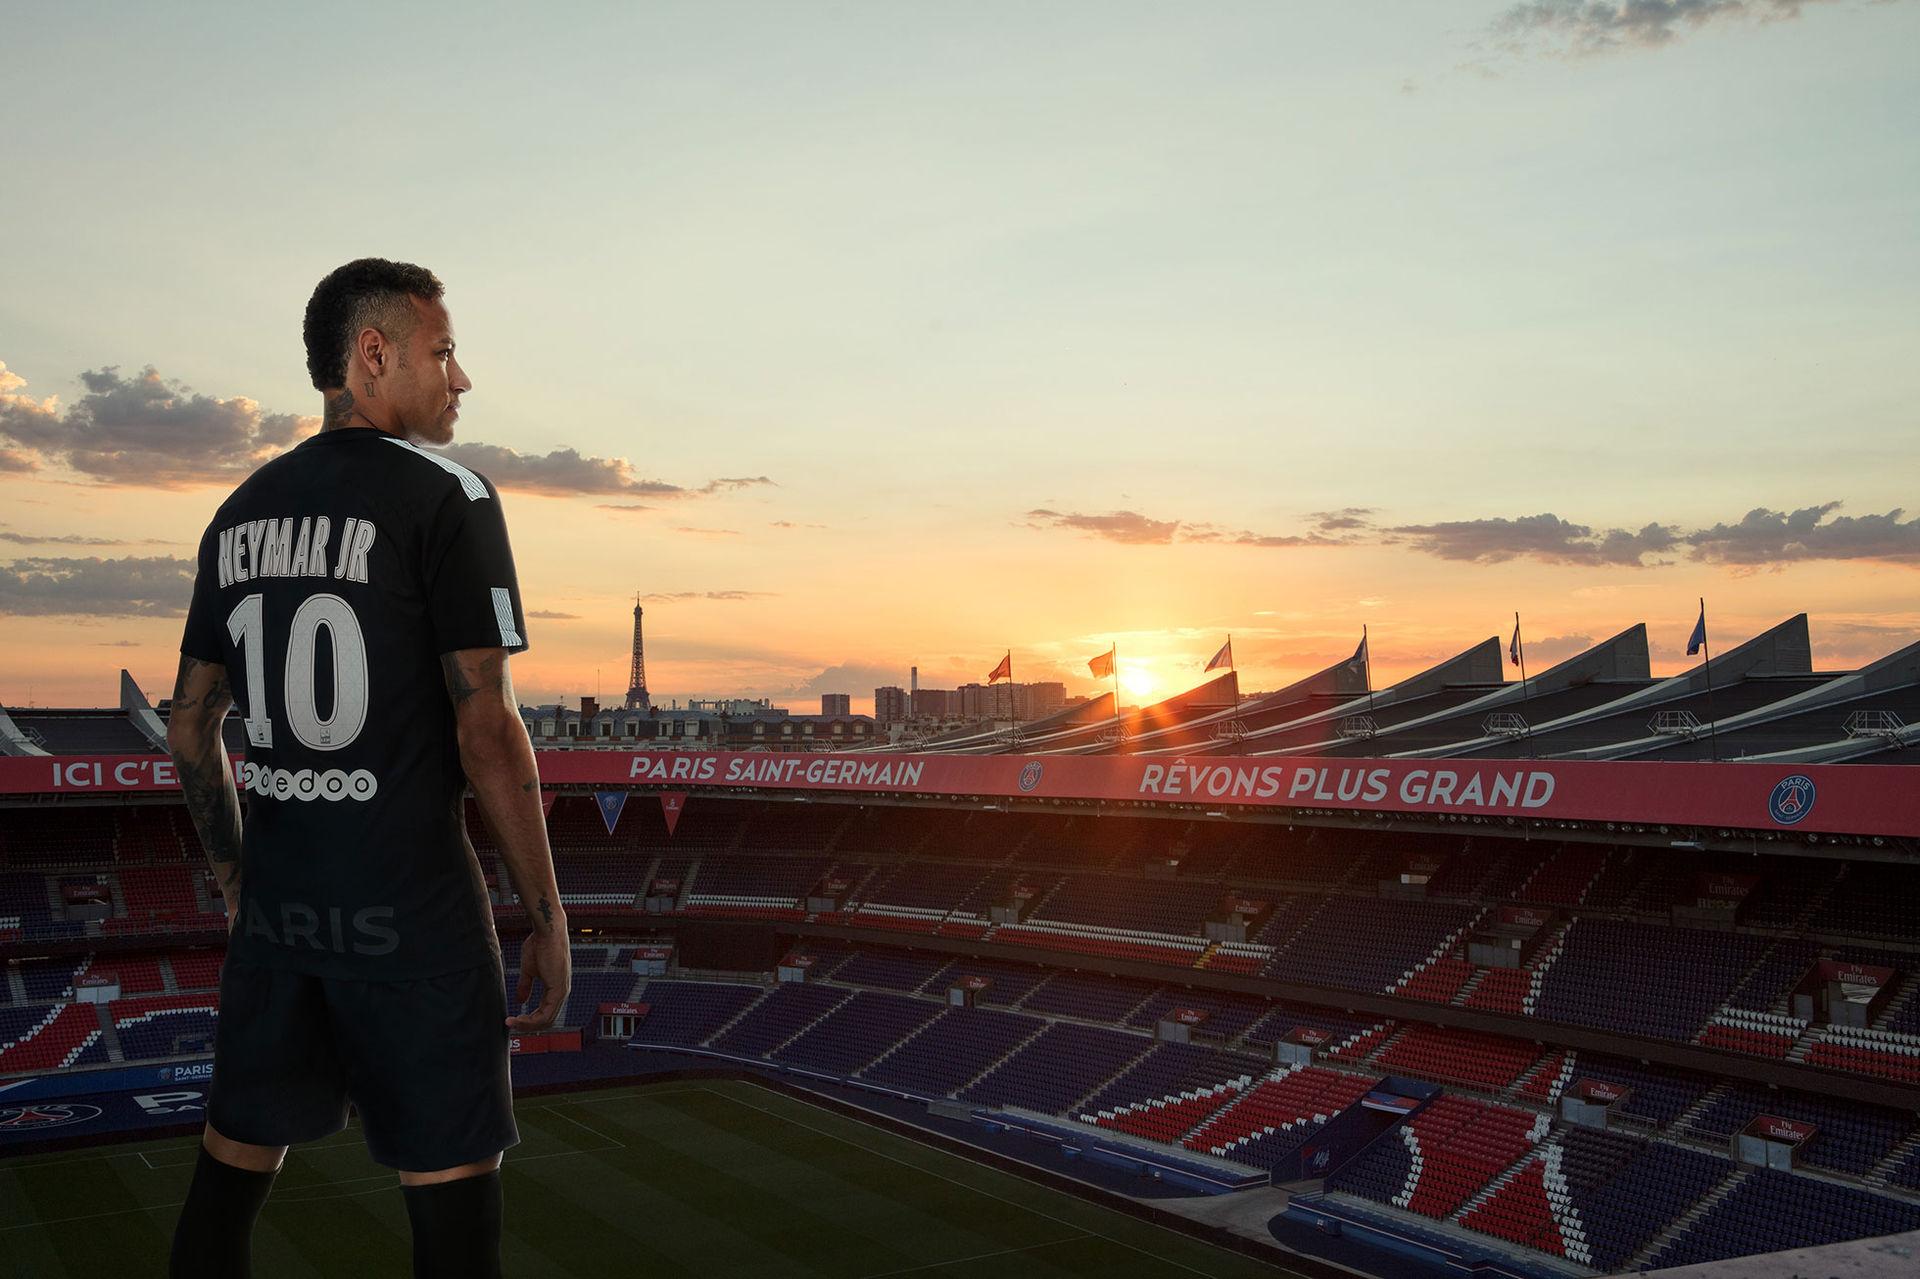 Neymar Jr visar PSGs tredjeställ